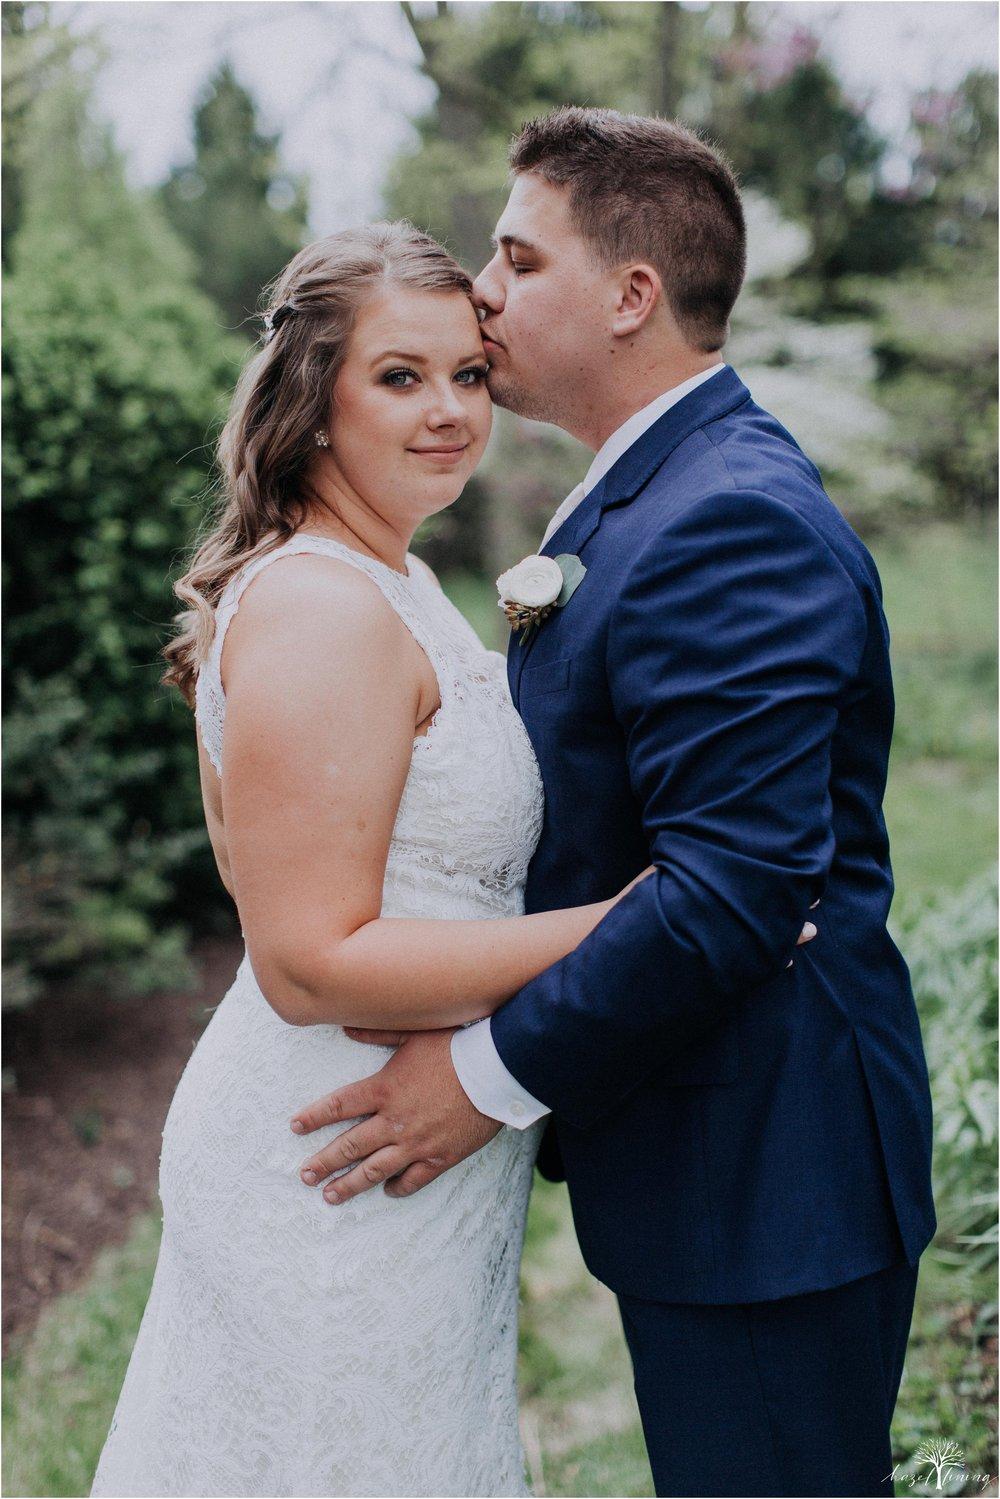 hazel-lining-travel-wedding-elopement-photography-abby-skyler-hunt-the-willis-house-york-pennsylvania-outdoor-estate-wedding_0037.jpg